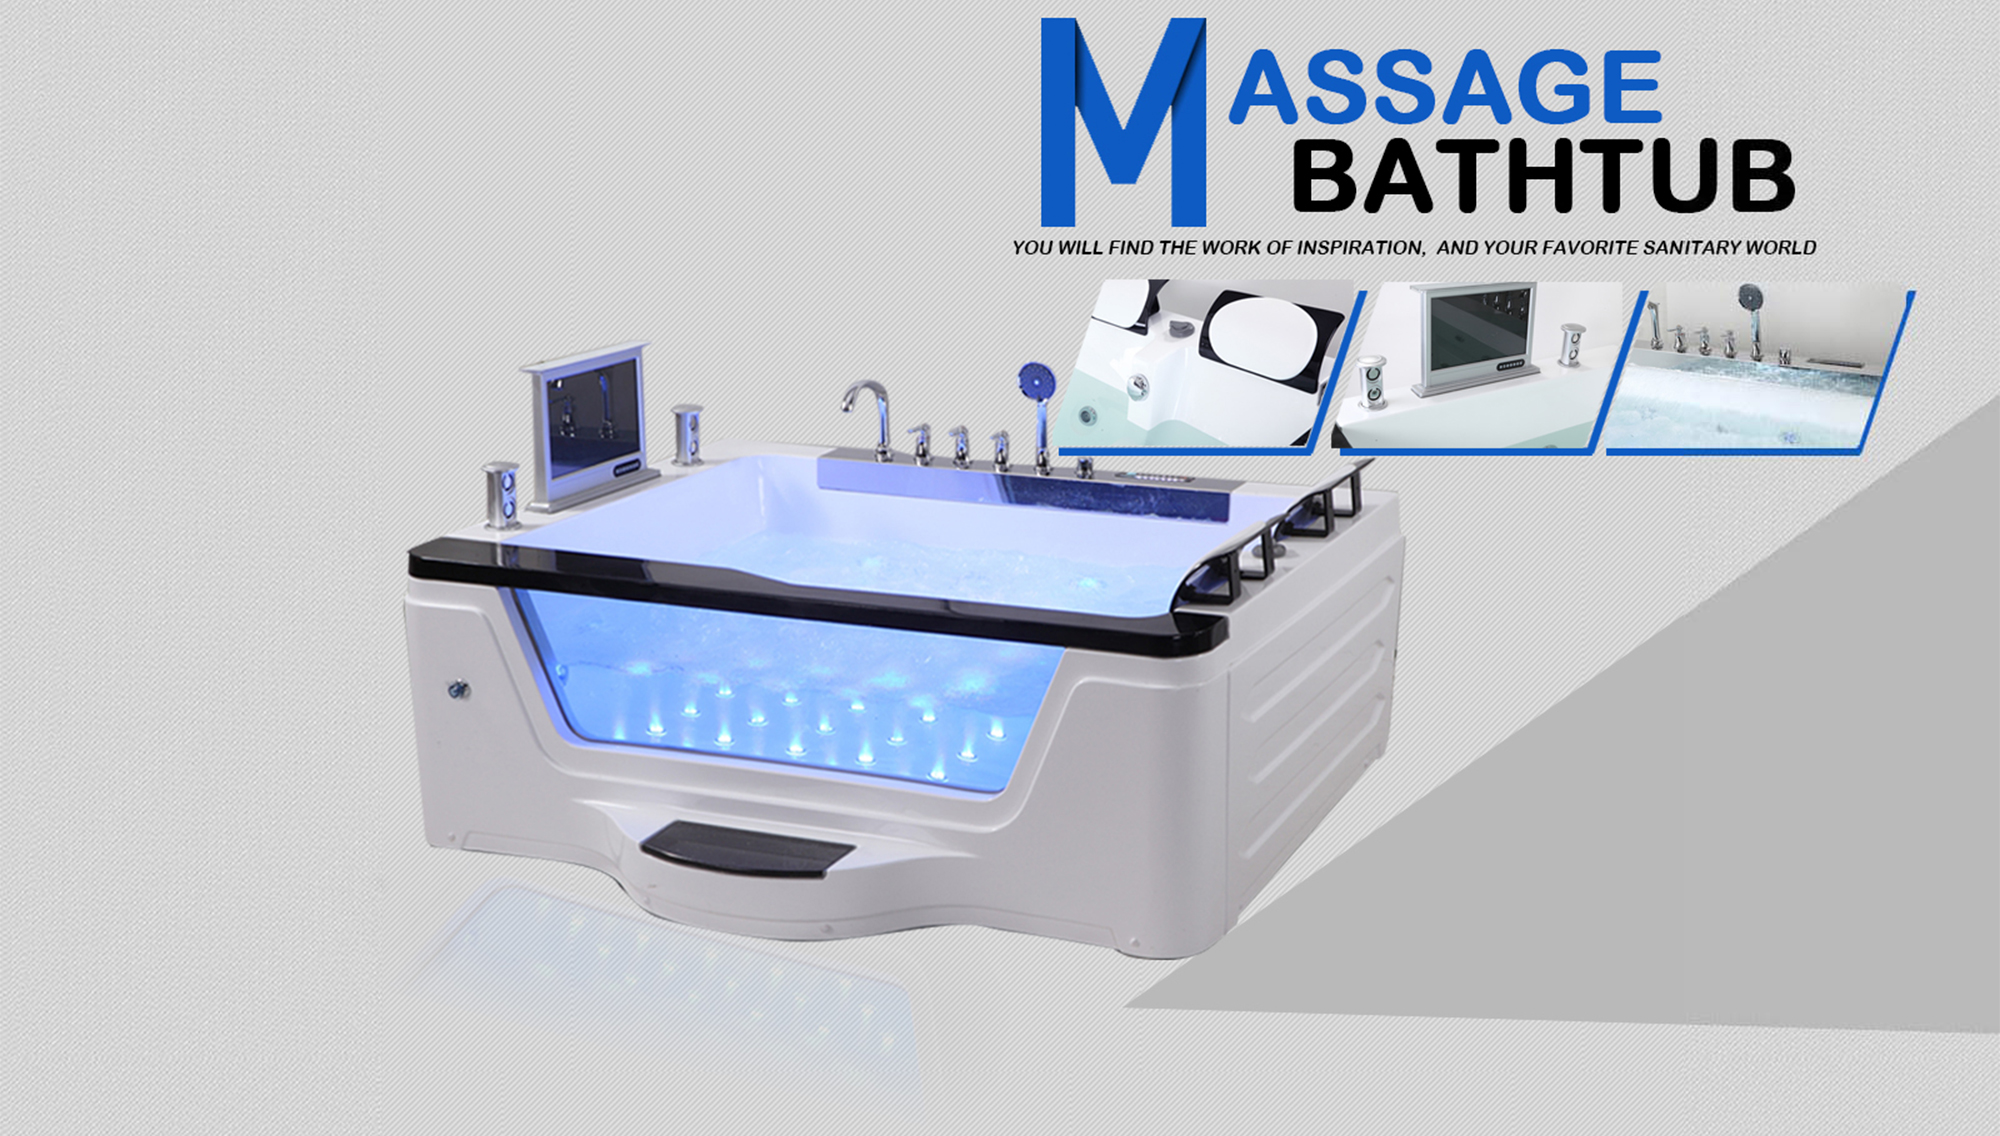 Foshan Hanse Industrial Co., Ltd. - Bathtub, Steam room